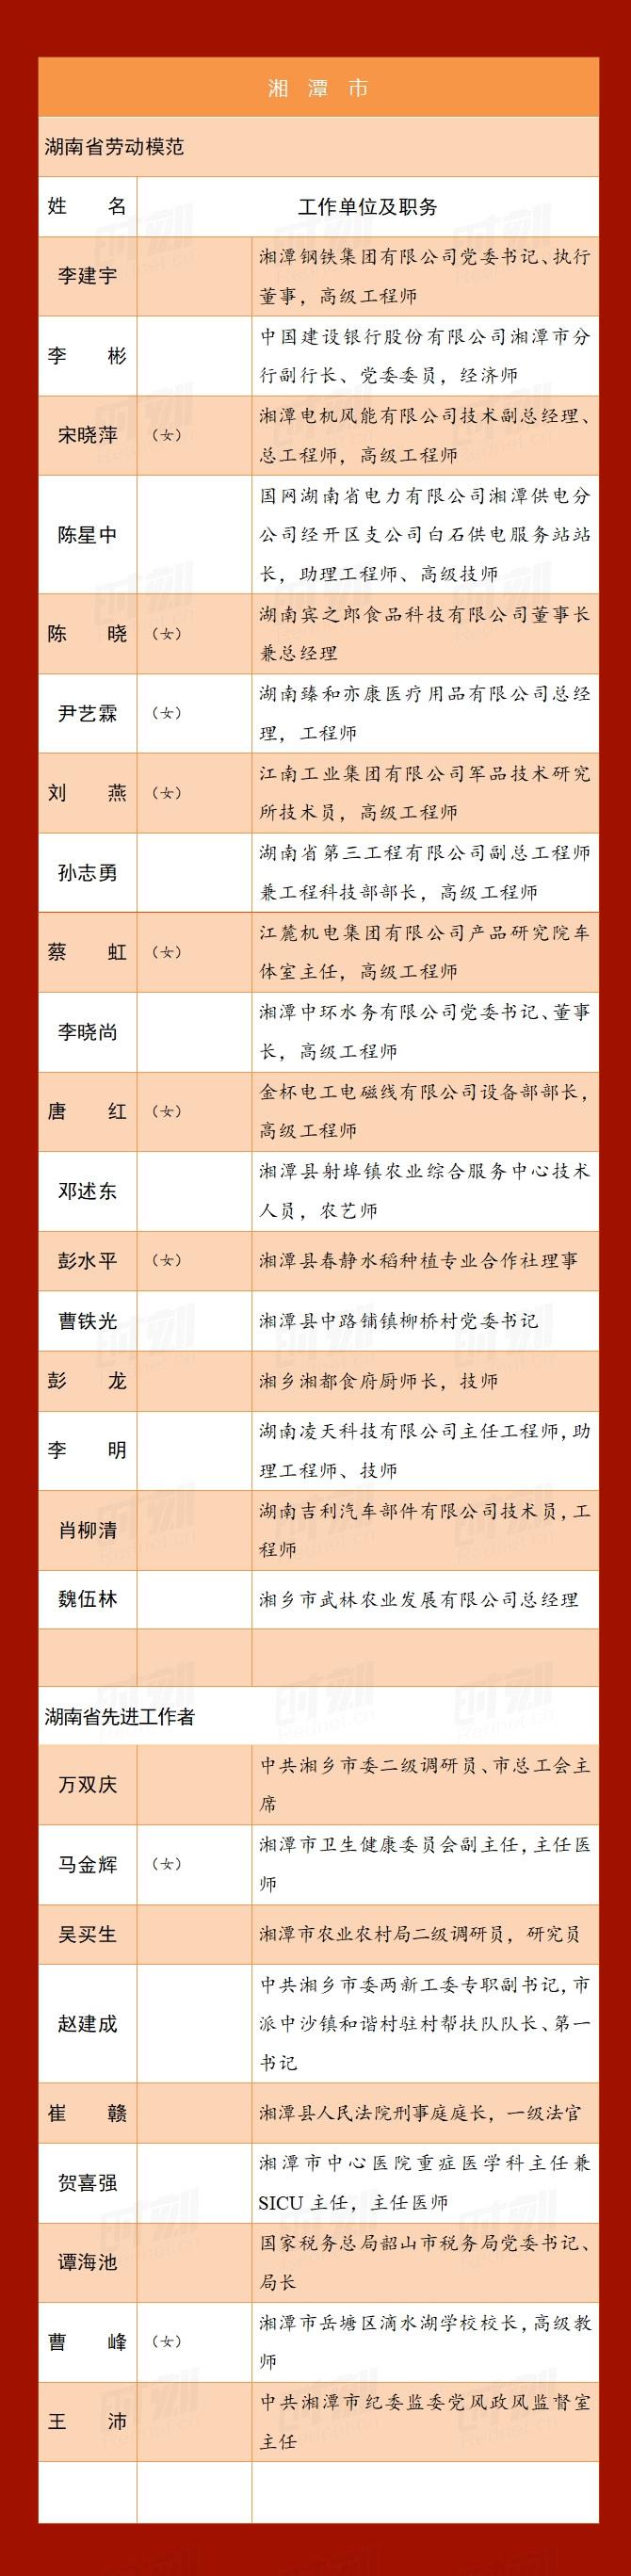 a4湘潭_r1_c1.jpg